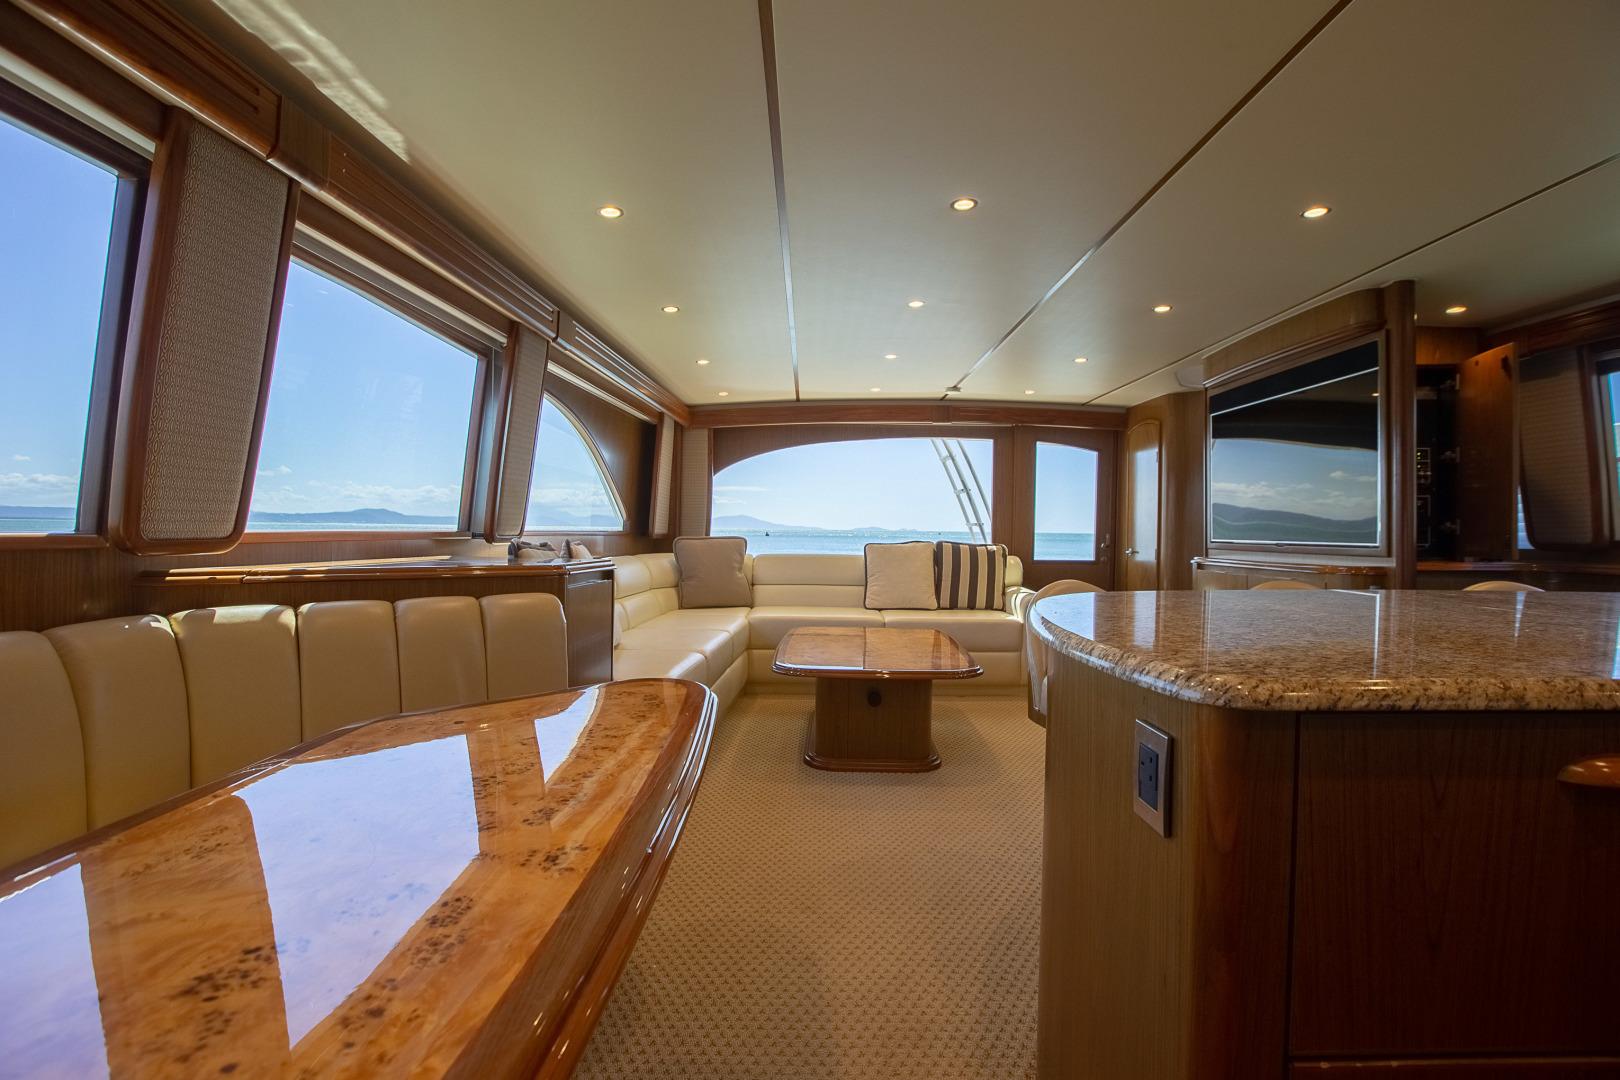 Viking-76 Enclosed Skybridge 2012-Reel Power Palm Beach-Florida-United States-Salon -1346565   Thumbnail